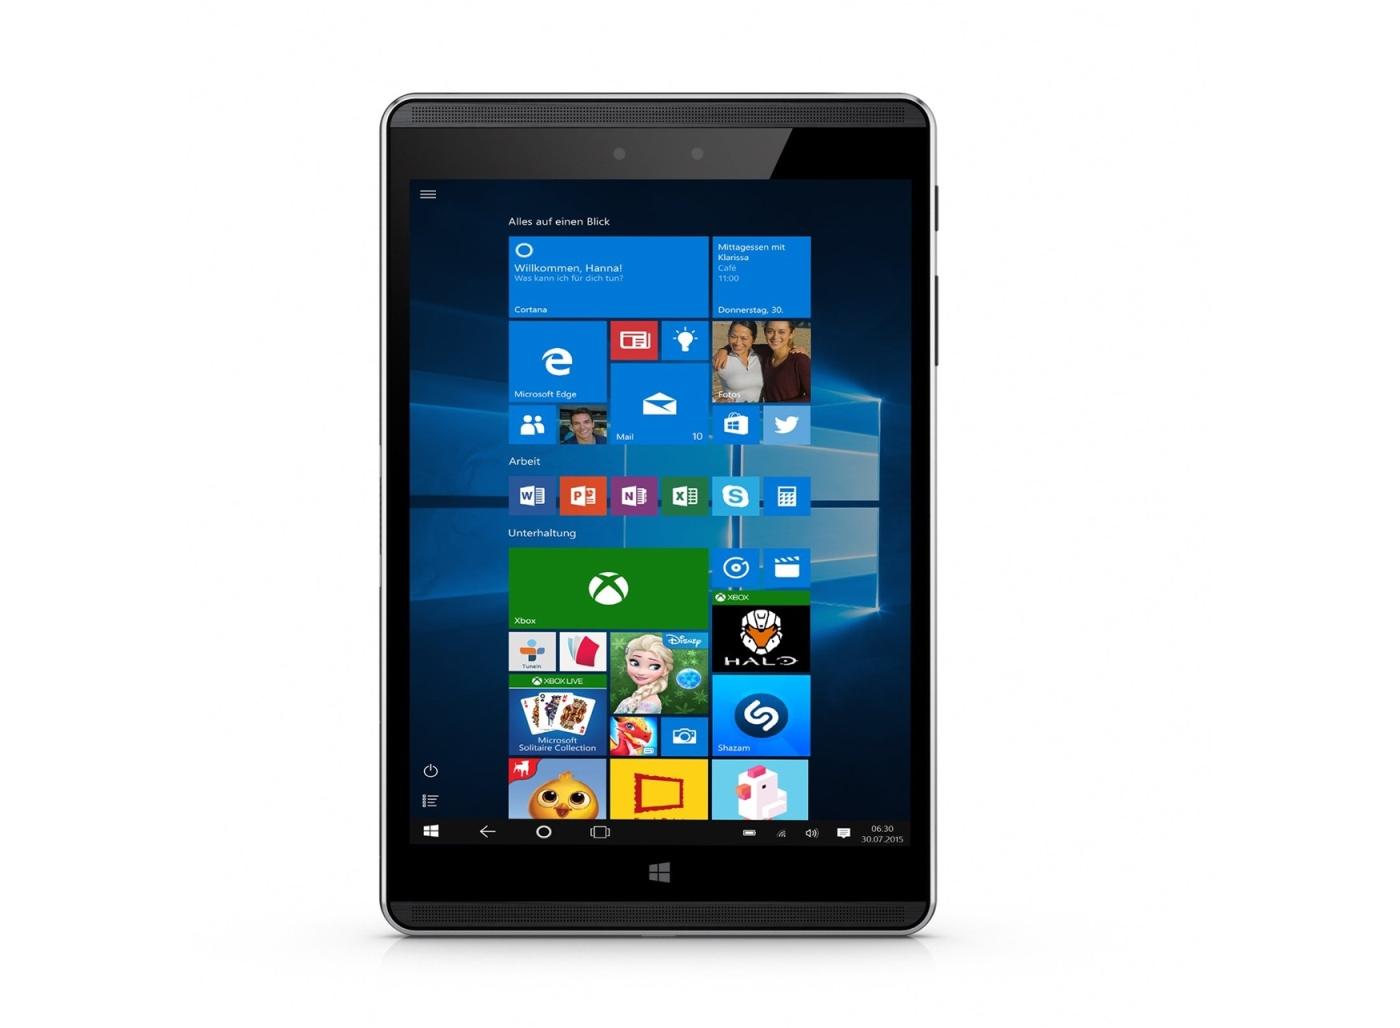 HP Pro Tablet 608 G1 T/Z8550/4GB/64GB/BT/4G/WIFI/NFC/W10Pro